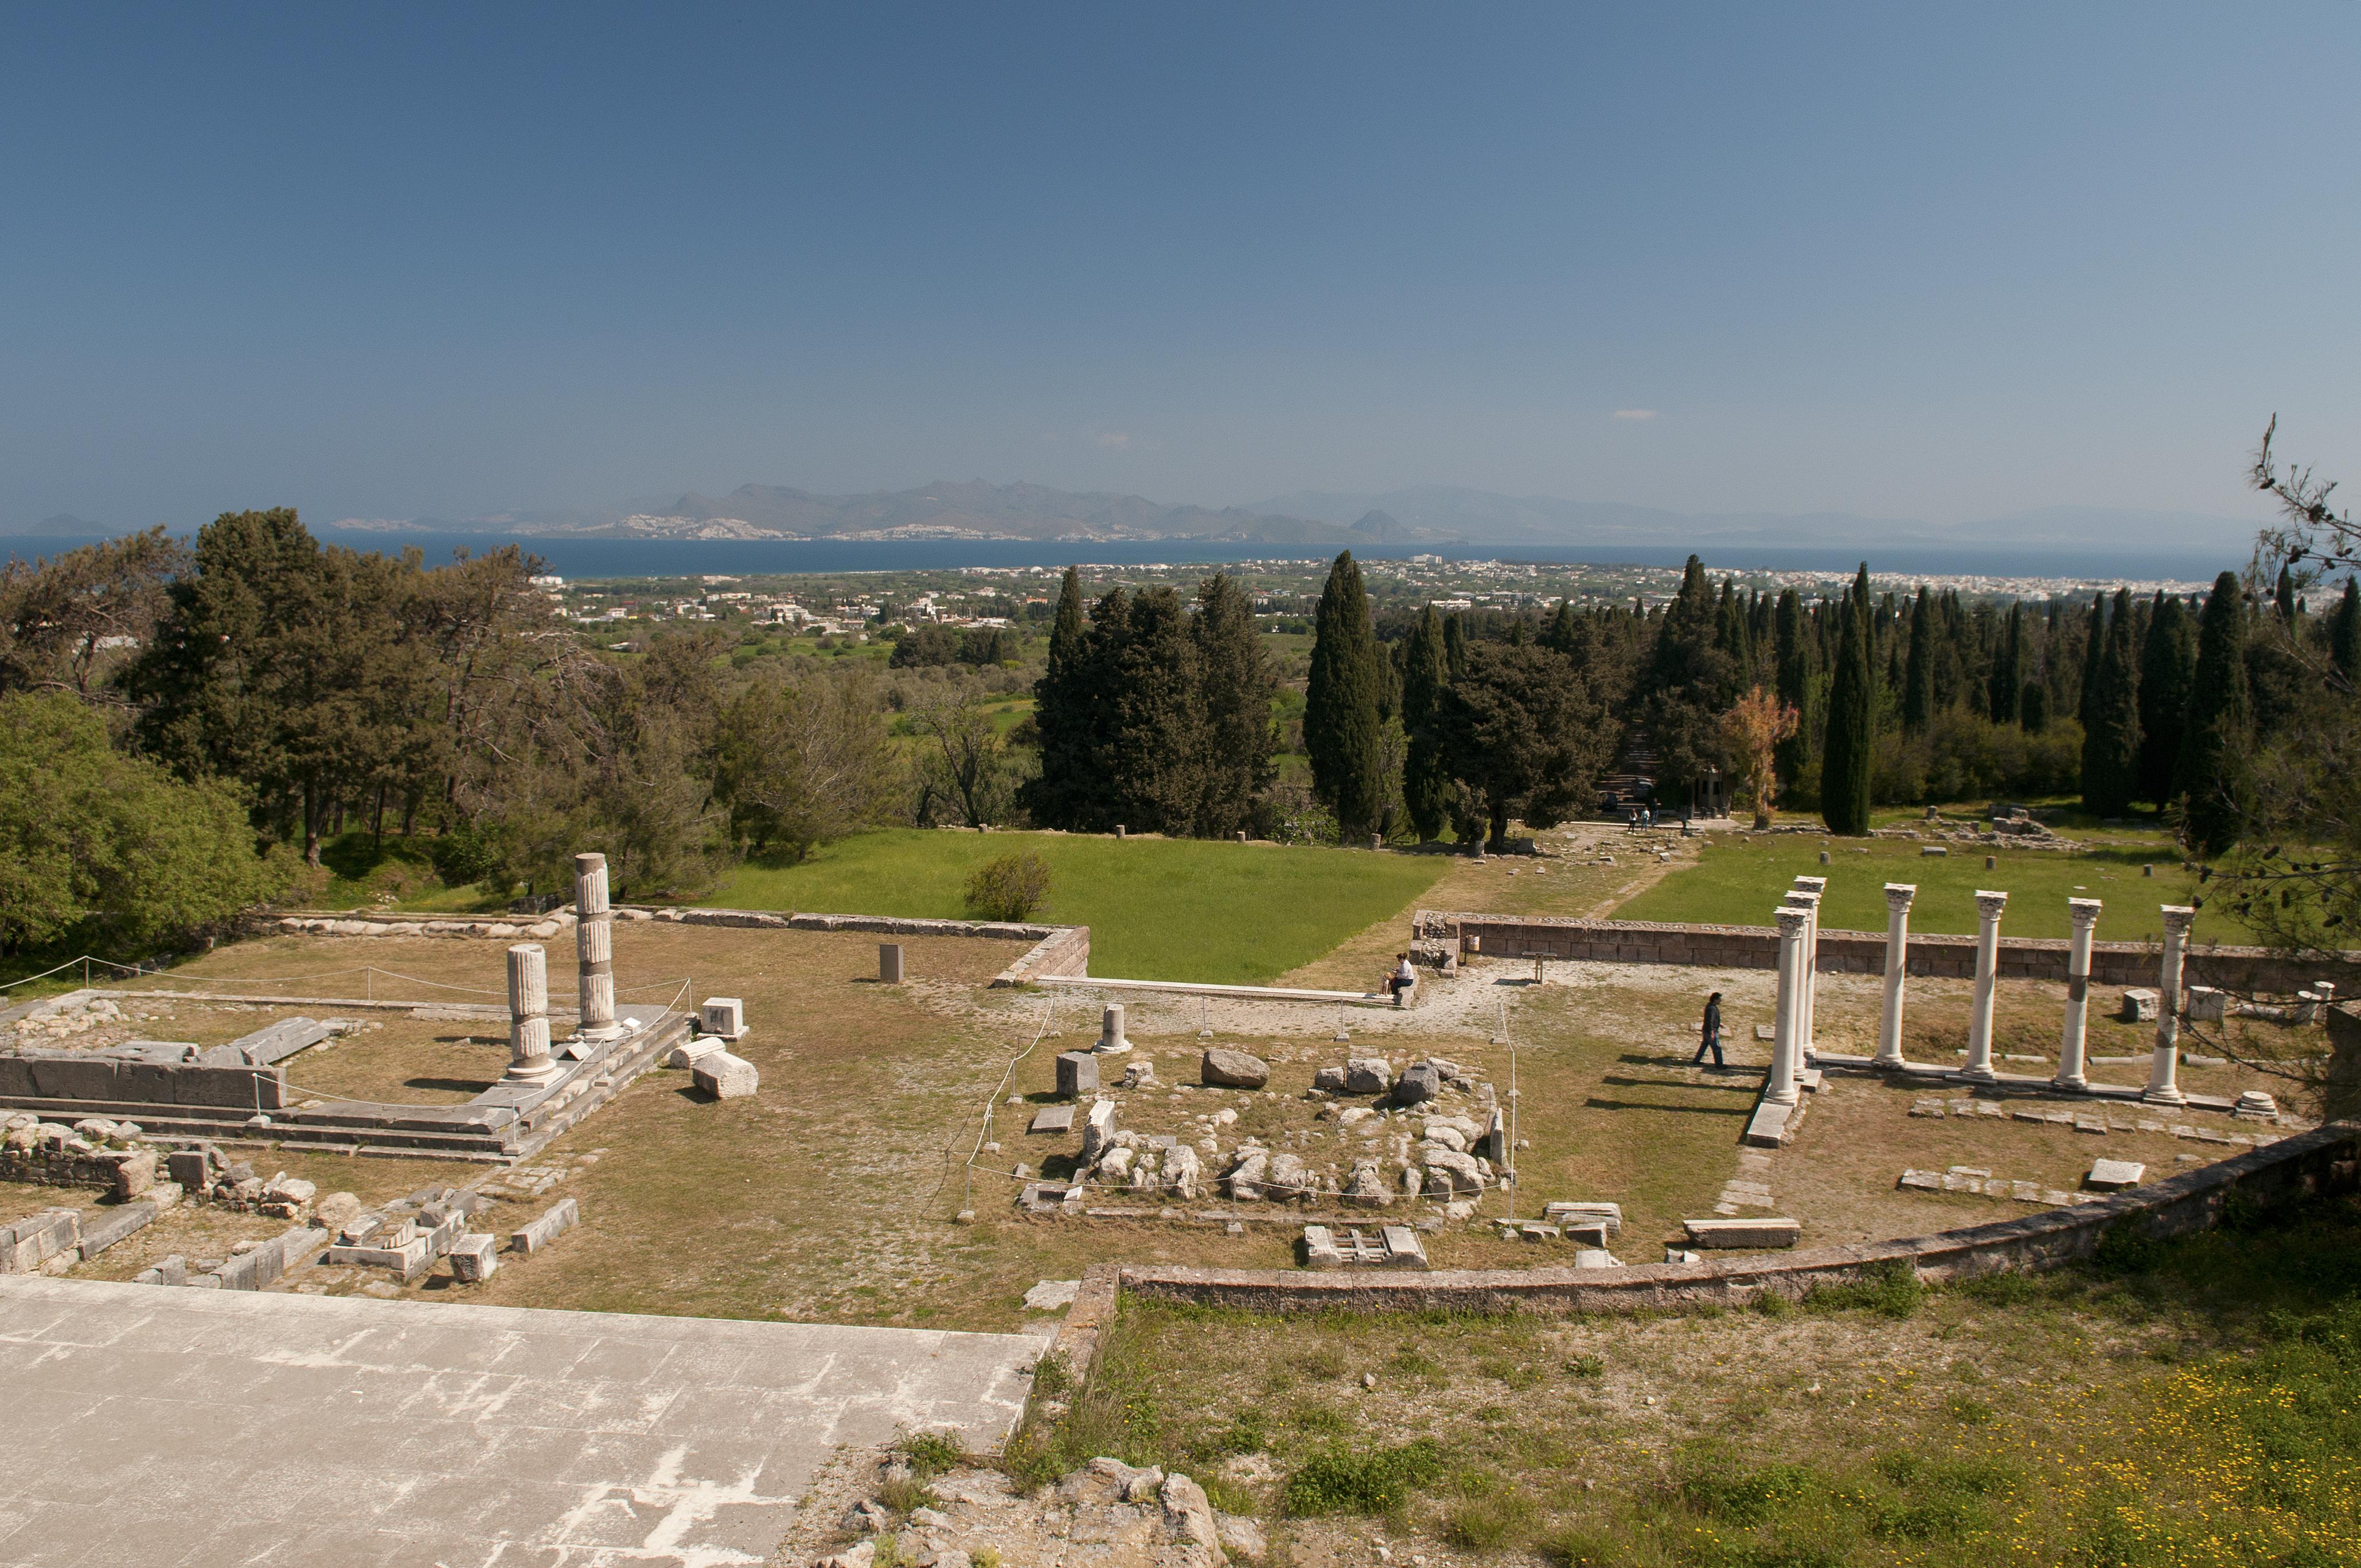 File:Asklepion, Kos, Greece (5652978891).jpg